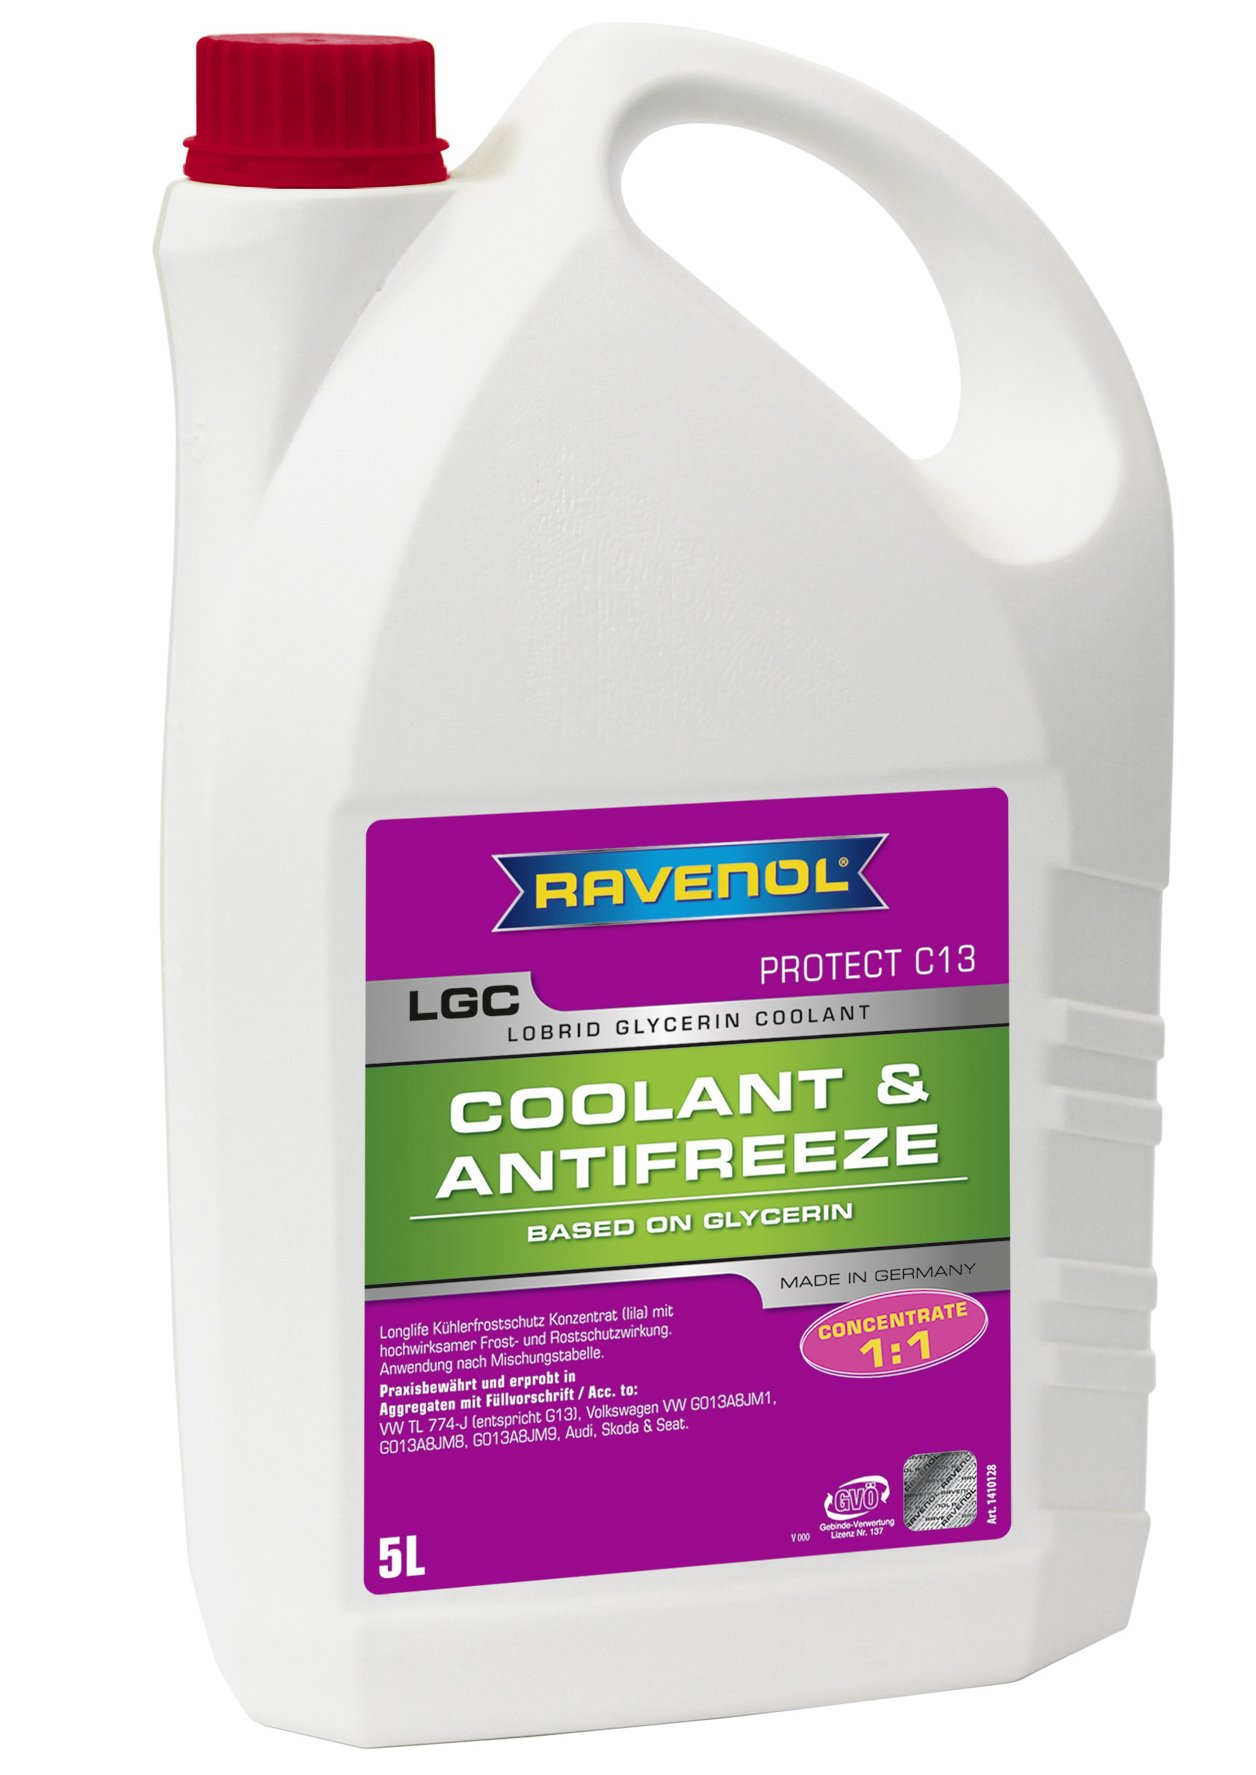 RAVENOL J4D2003 Coolant Antifreeze - LGC C13 Concentrate VW TL 774-J (G13) (5 Liter)